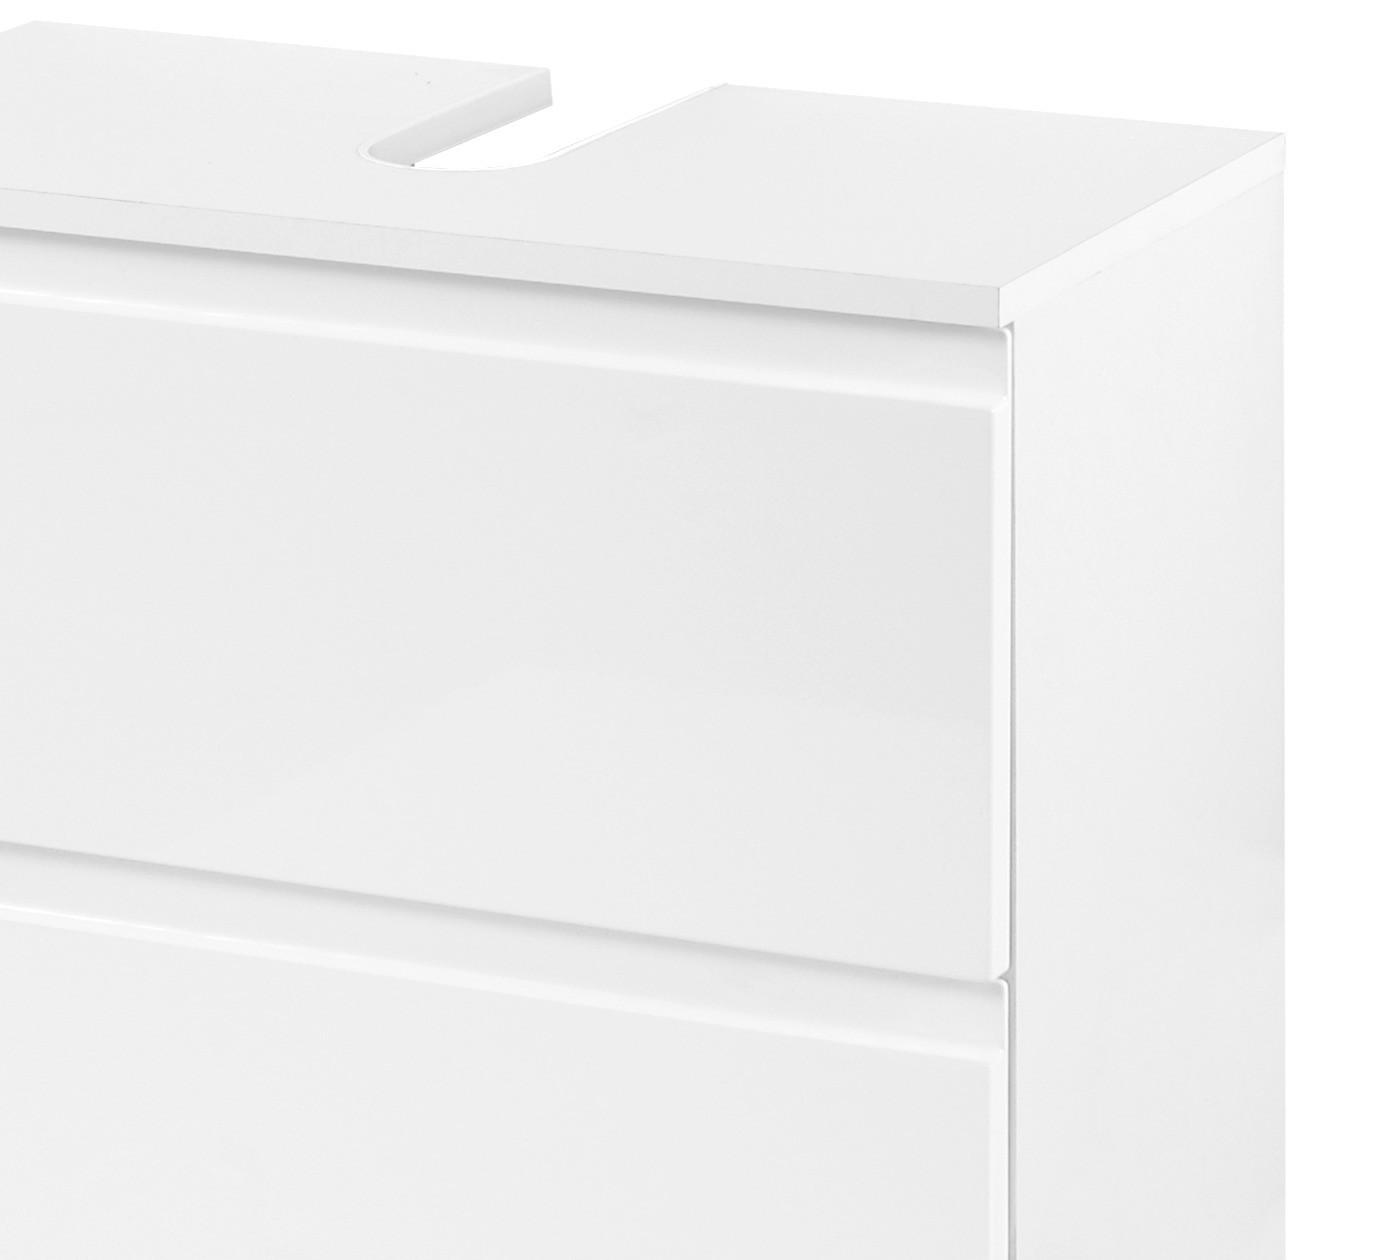 Bad waschbeckenunterschrank cardiff 1 auszug 1 klappe 60 cm breit hochglanz wei bad cardiff for Bad waschbeckenunterschrank